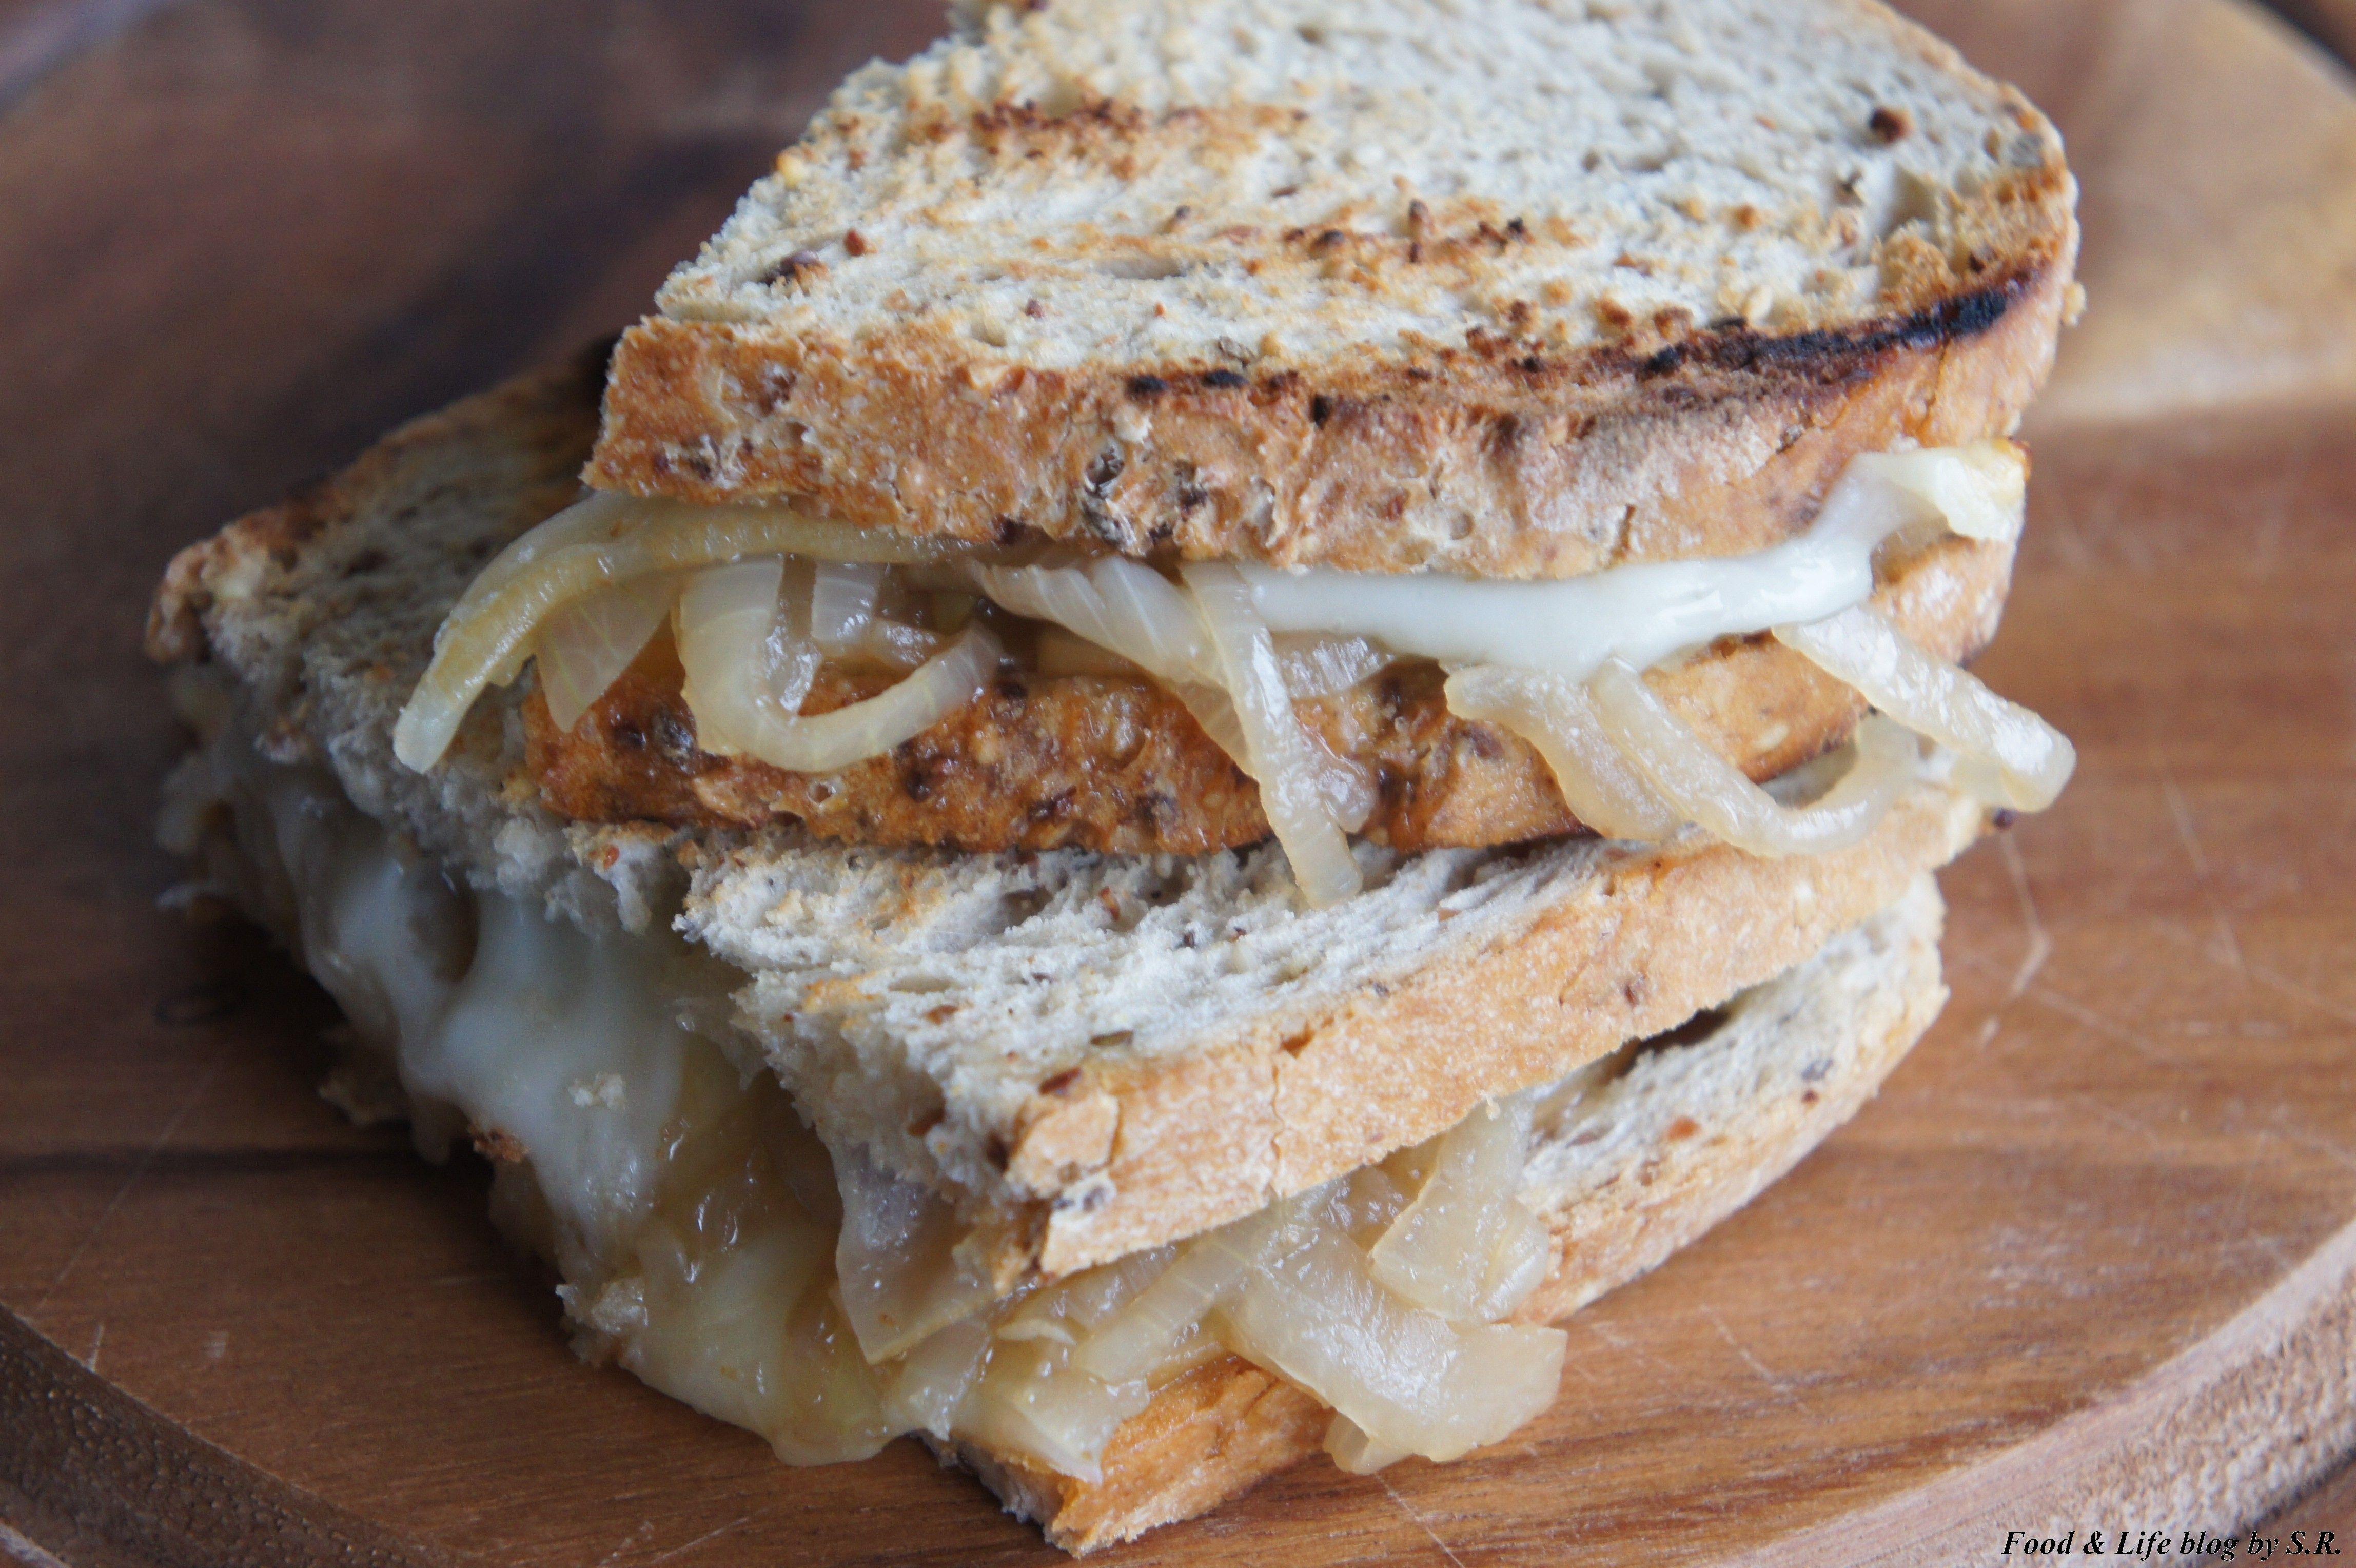 Panino gourmet con formaggio affumicato e cipolle http://wp.me/p3OzLs-3m